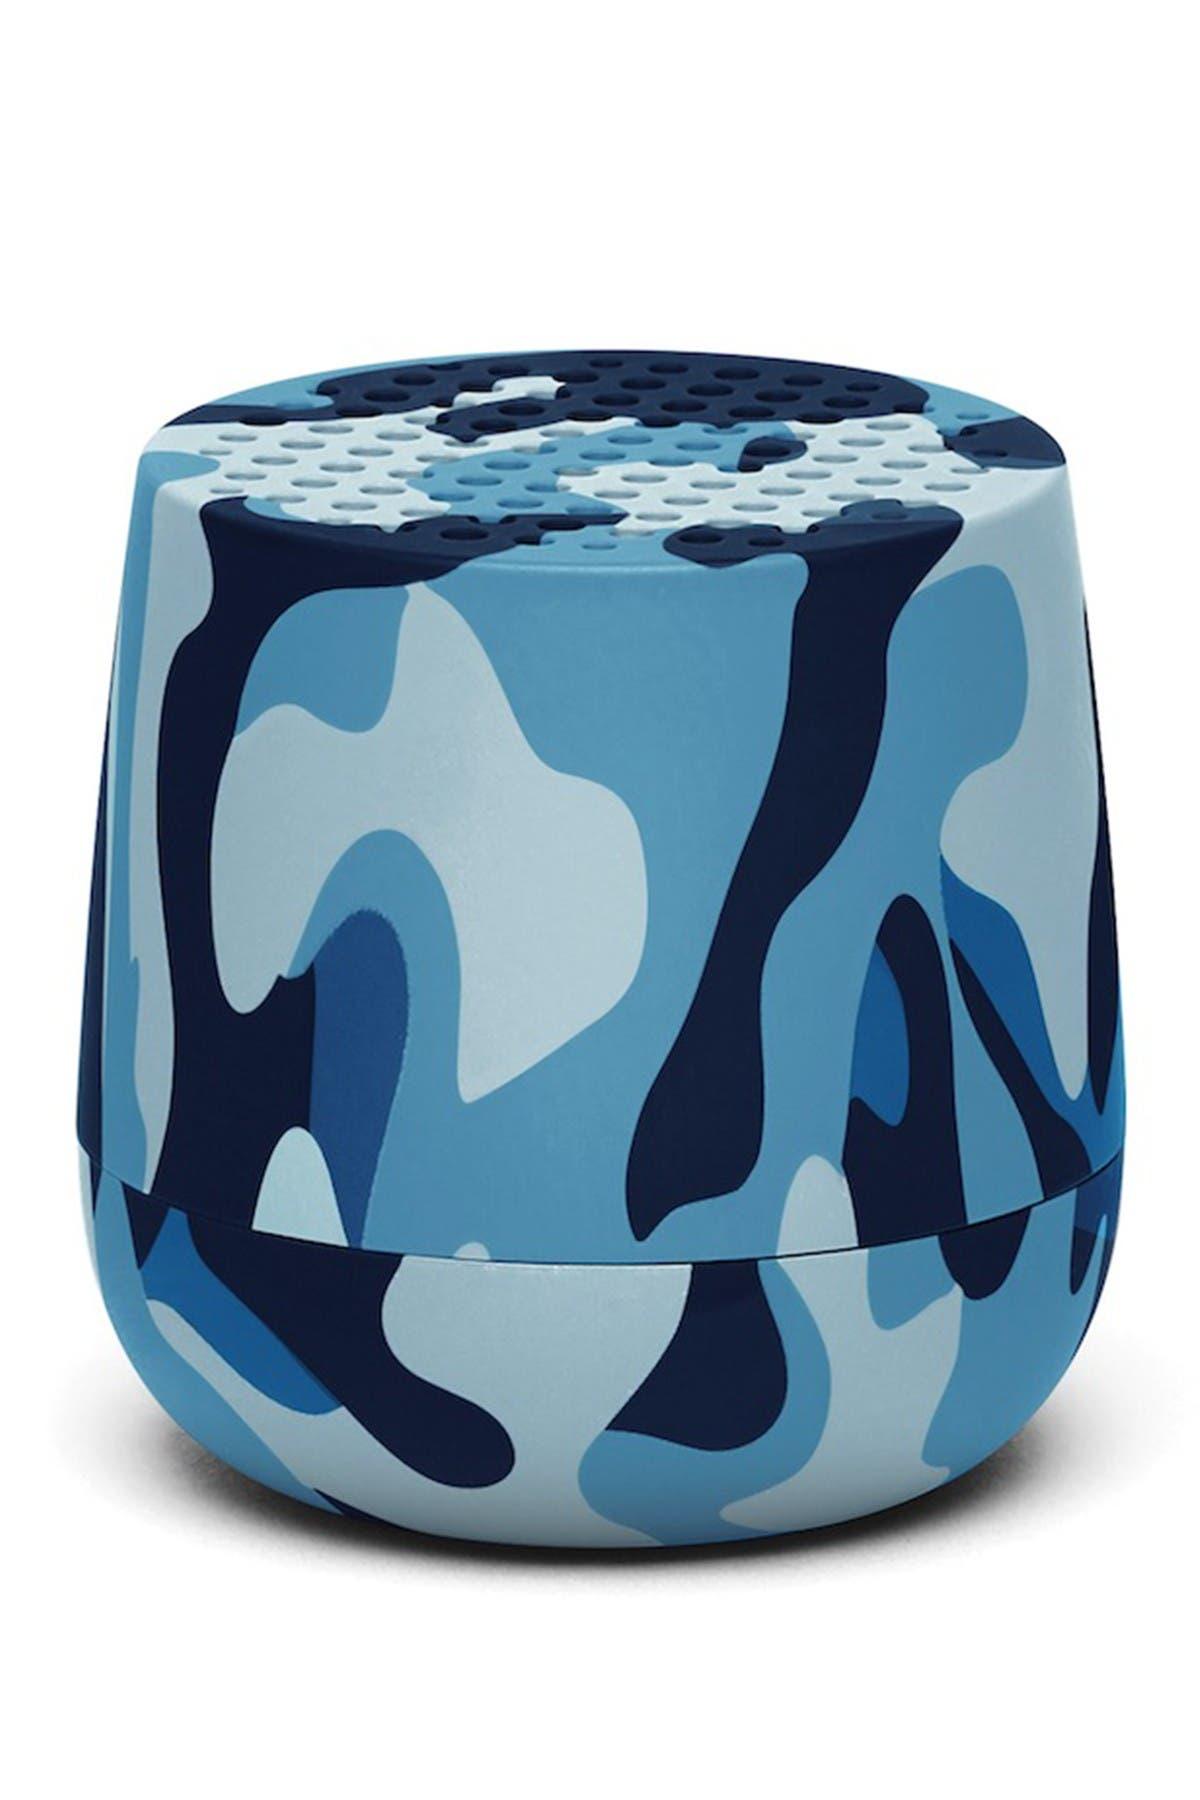 Image of Lexon MINO 3W Portable Bluetooth Speaker - Camo Blue